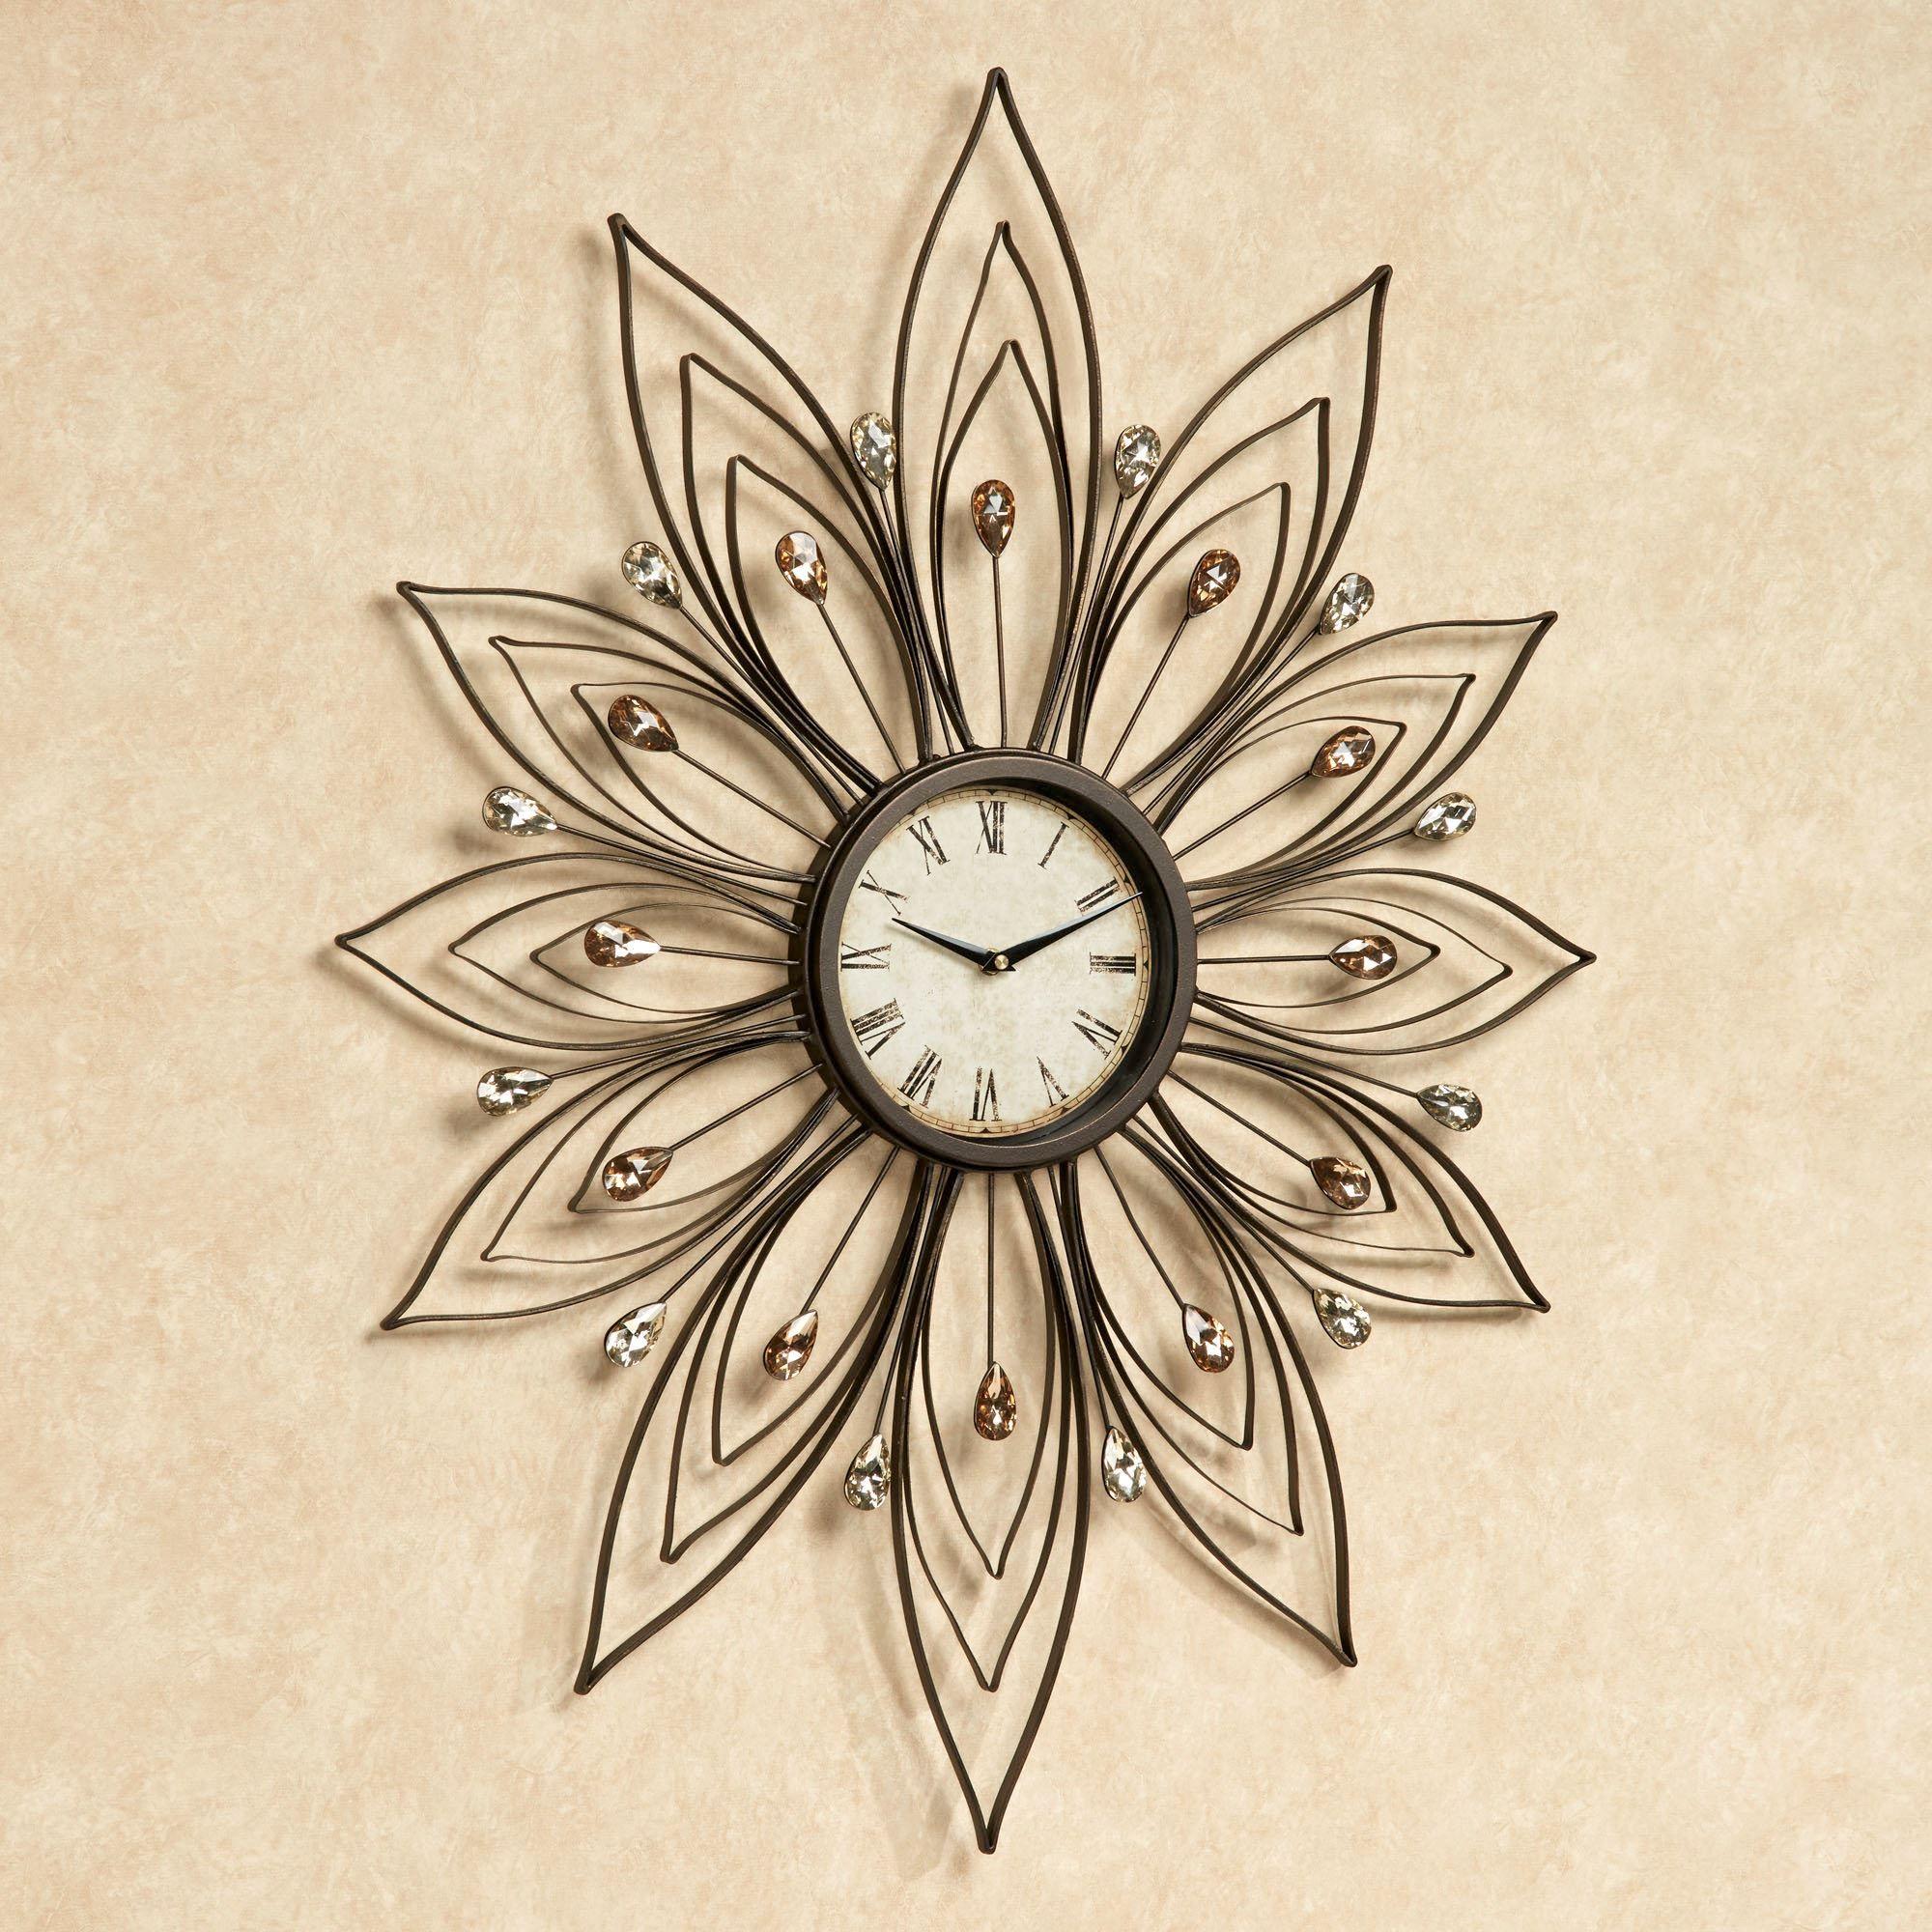 Bejeweled Flower Shaped Metal Wall Clock